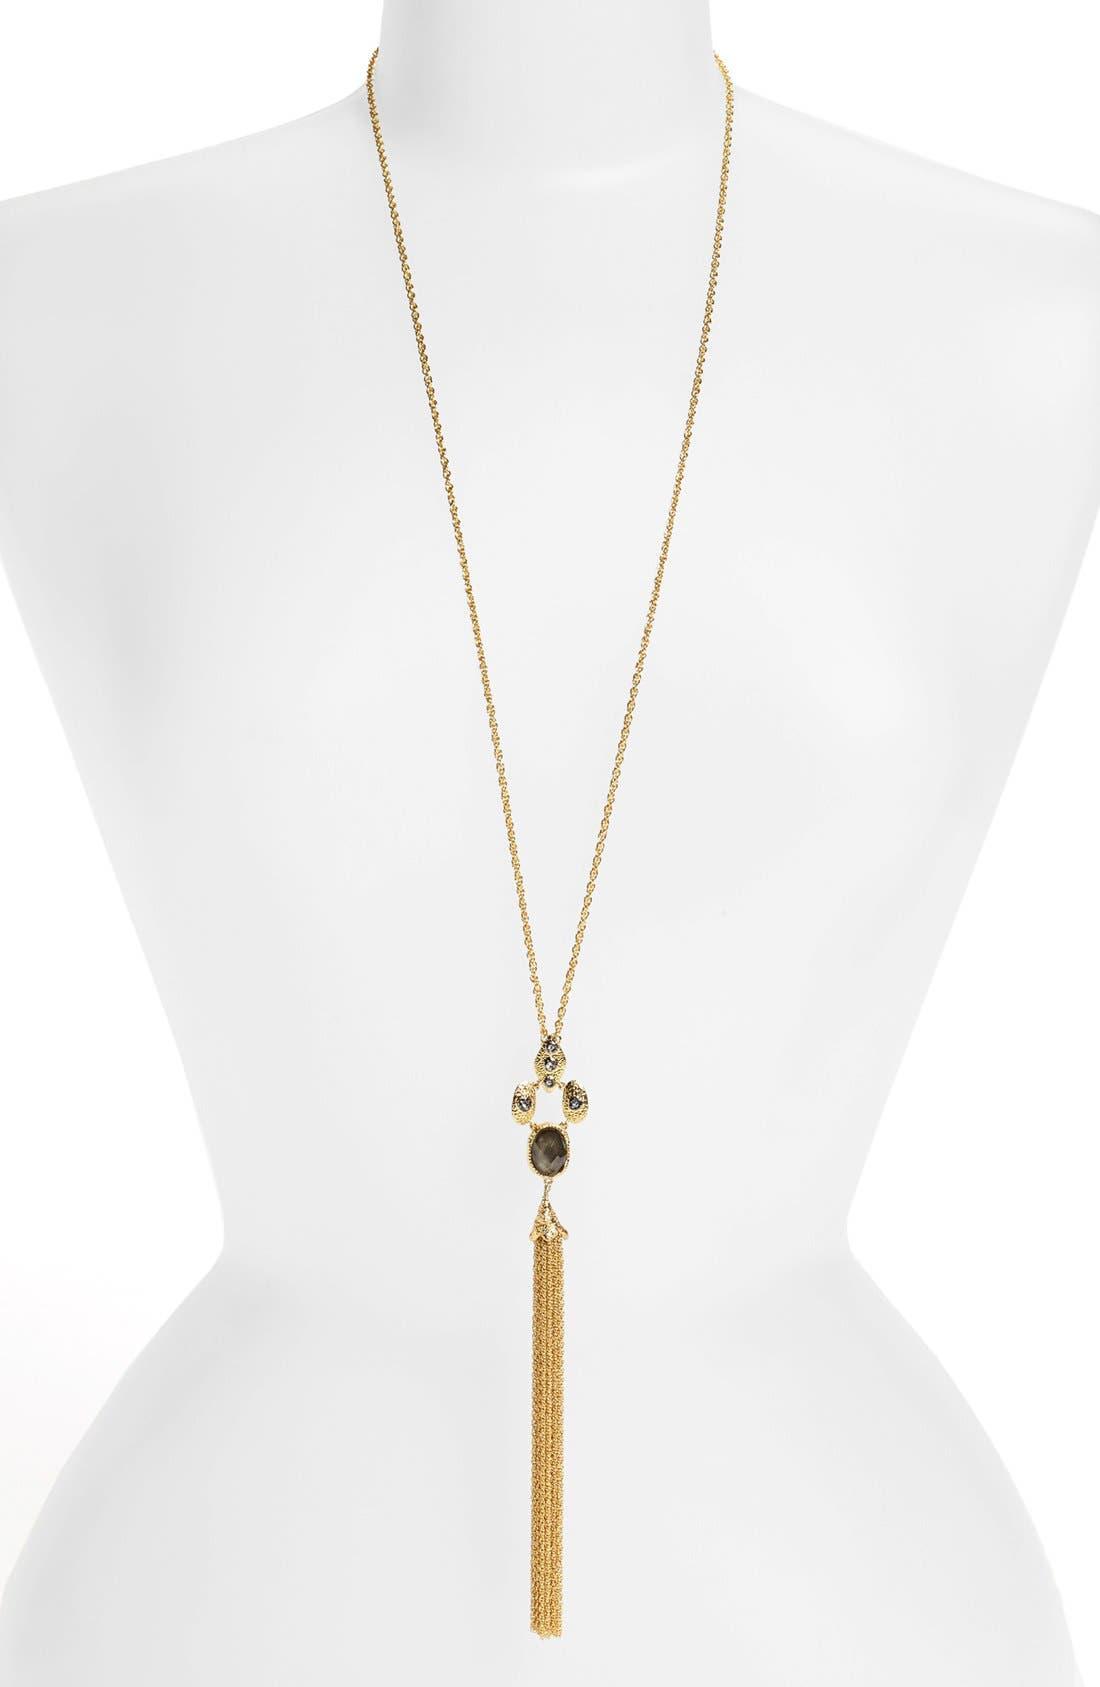 Alternate Image 1 Selected - Alexis Bittar 'Elements' Long Tassel Pendant Necklace